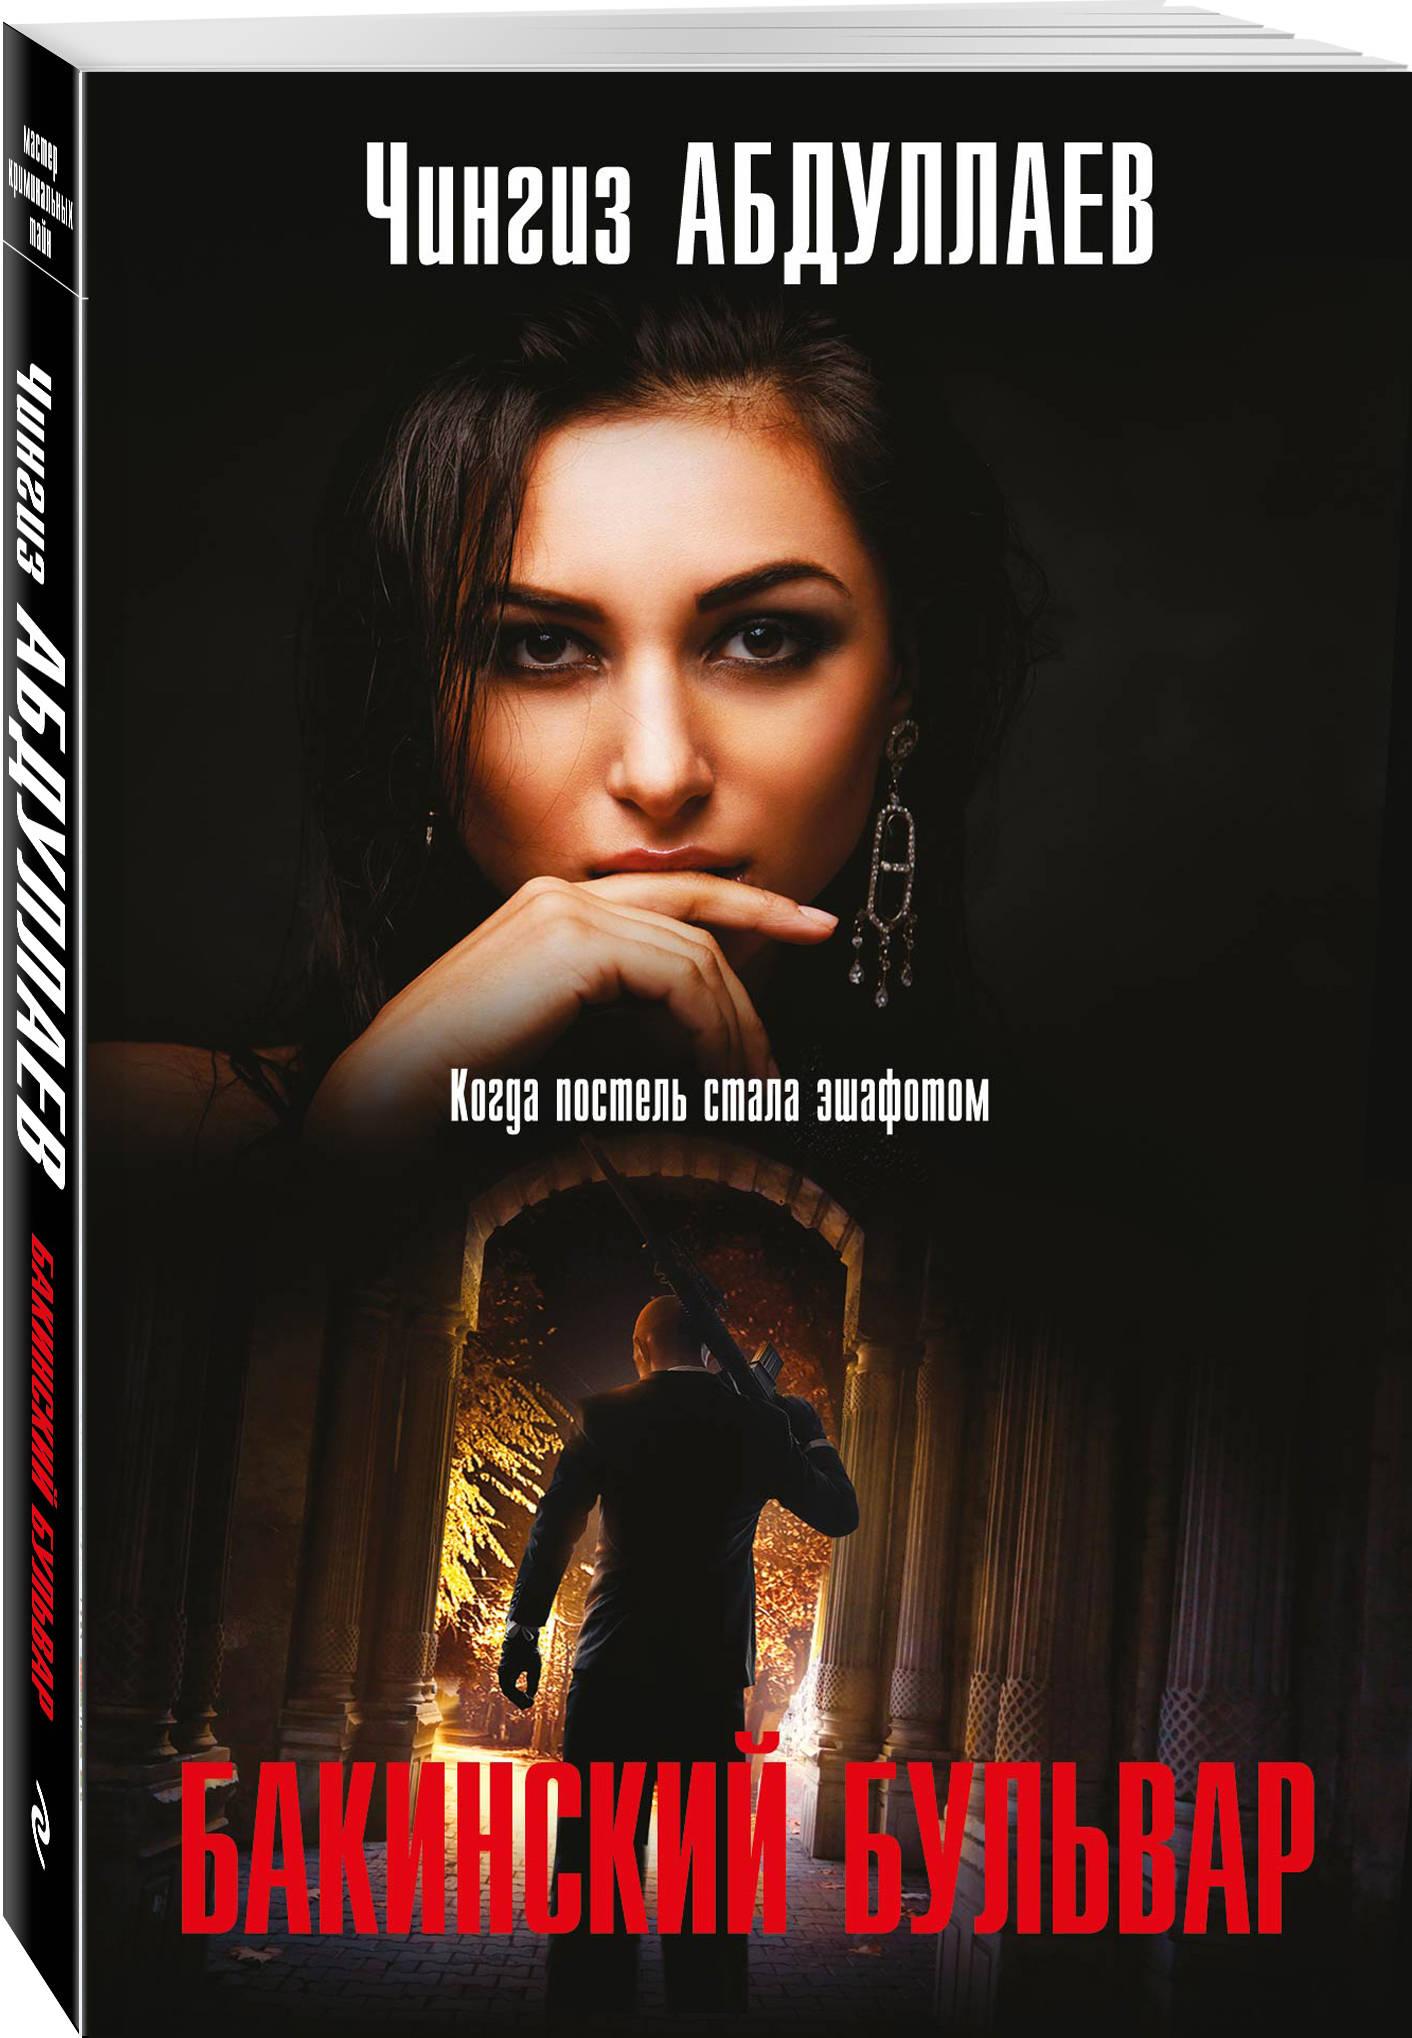 Чингиз Абдуллаев Бакинский бульвар абдуллаев чингиз акифович тоннель призраков